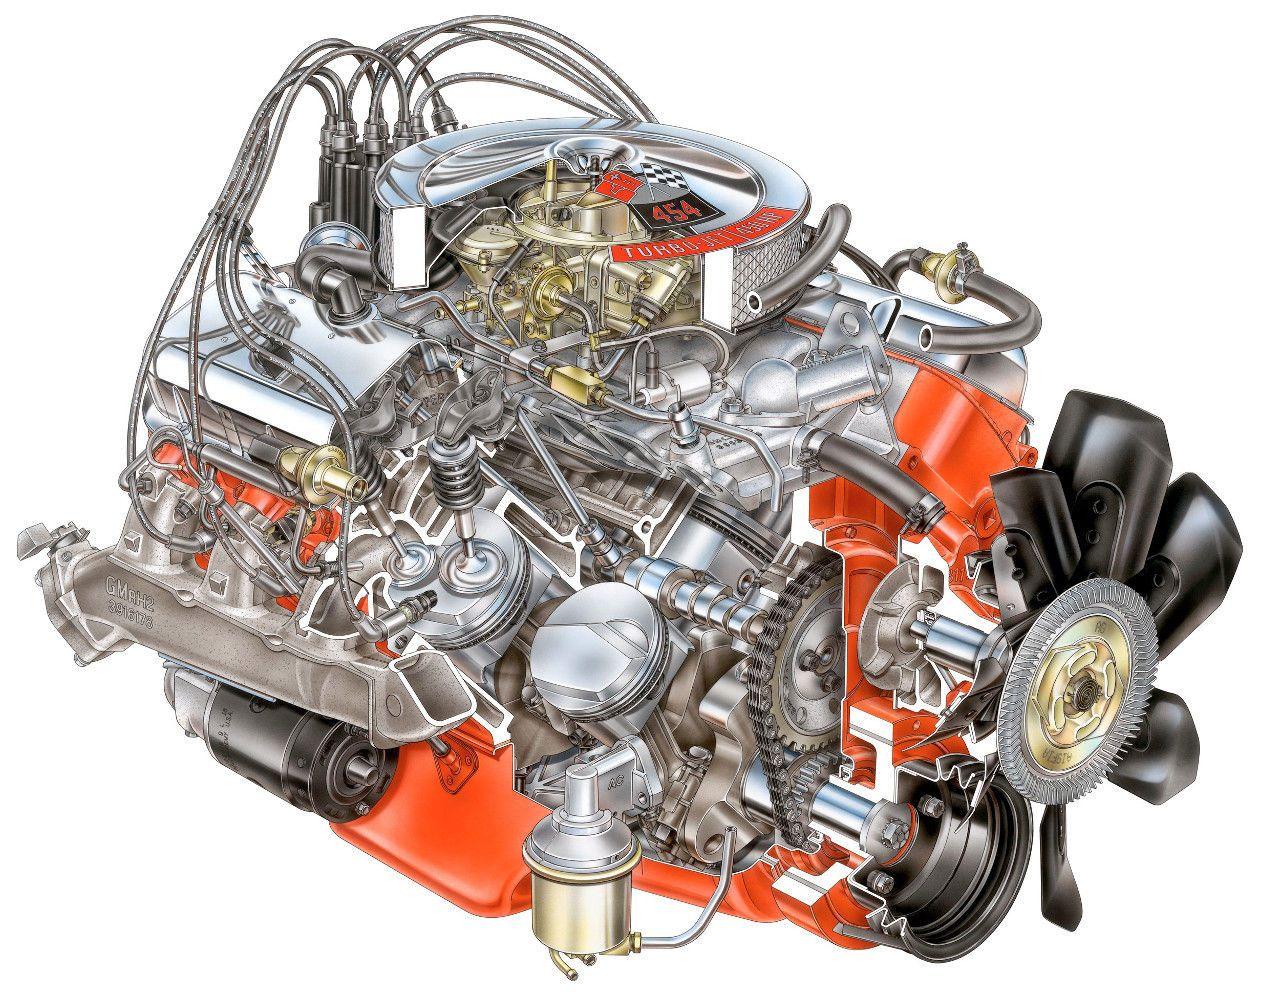 1970 CHEVROLET CHEVY ENGINE 454 V8 LS6 CUTAWAY POSTER PRINT 28x36 HI RES    eBay   Chevrolet, Big block, Chevy   Chevrolet Engine Cutaway Diagram      Pinterest